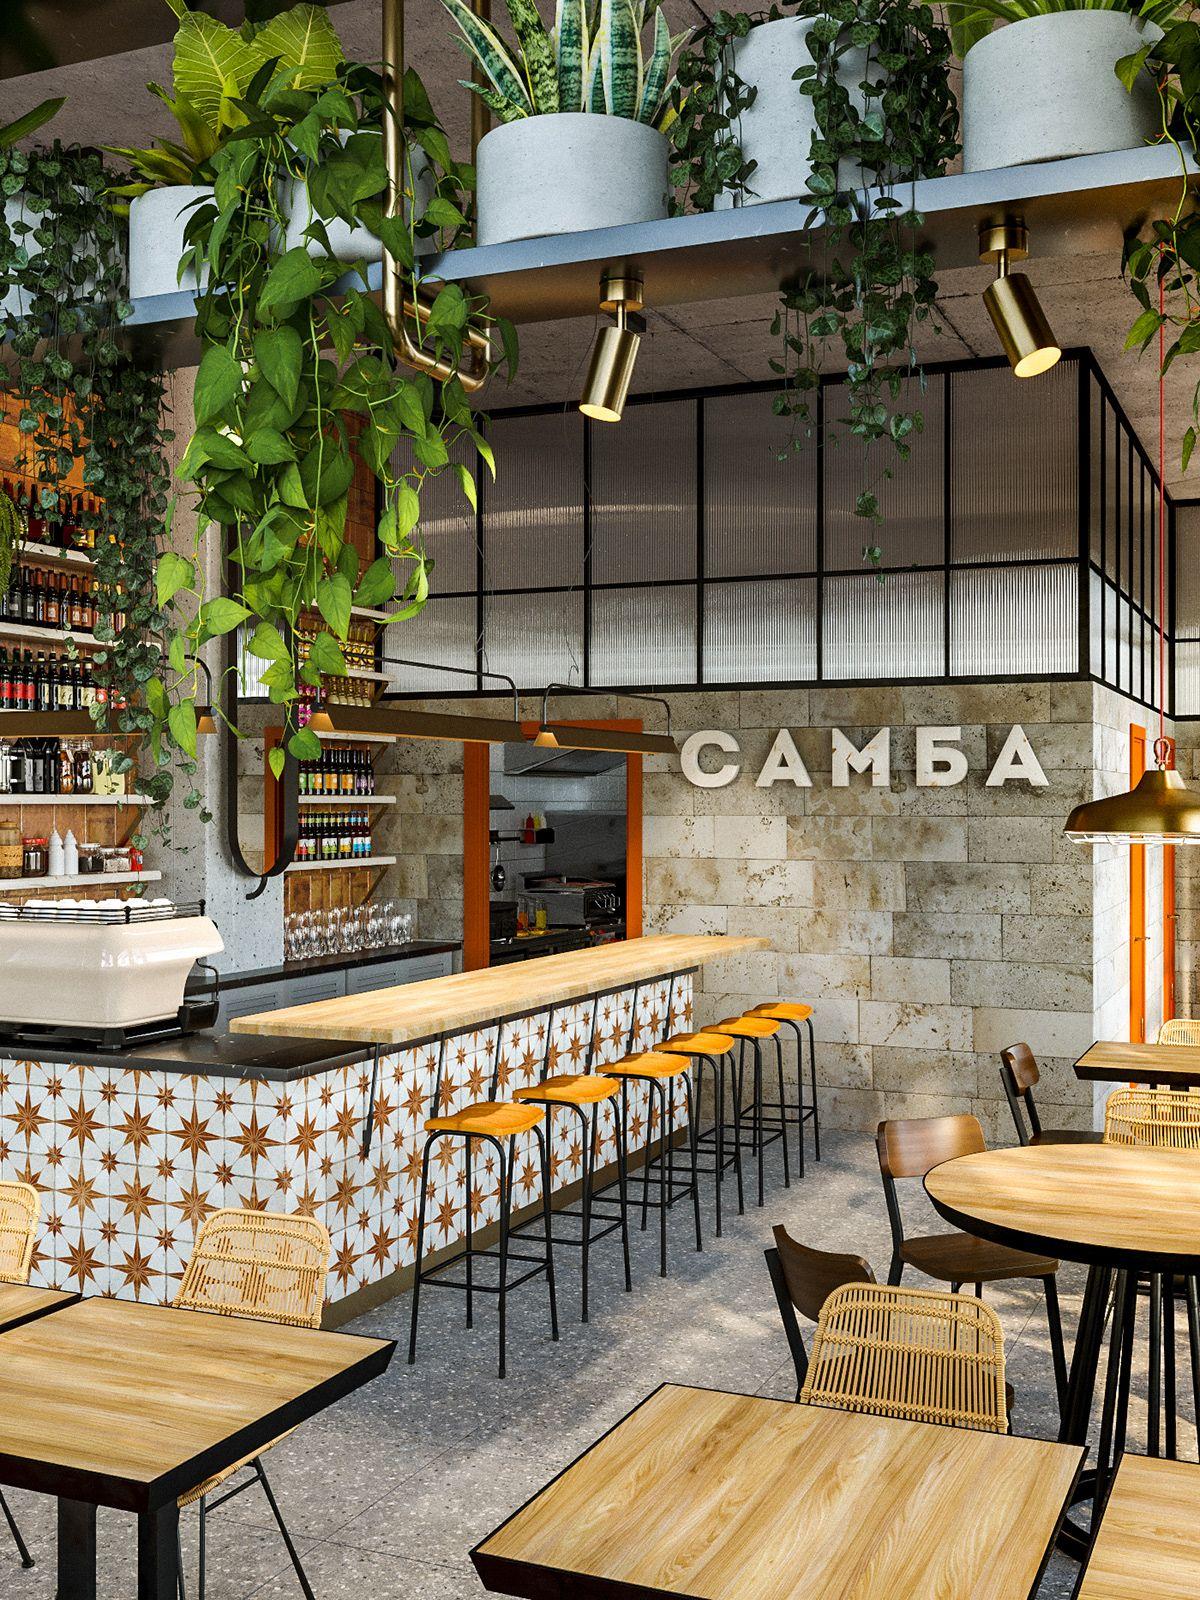 Samba Cafe Interior On Behance Cafe Interior Design Cafe Bar Design Cafe Interior